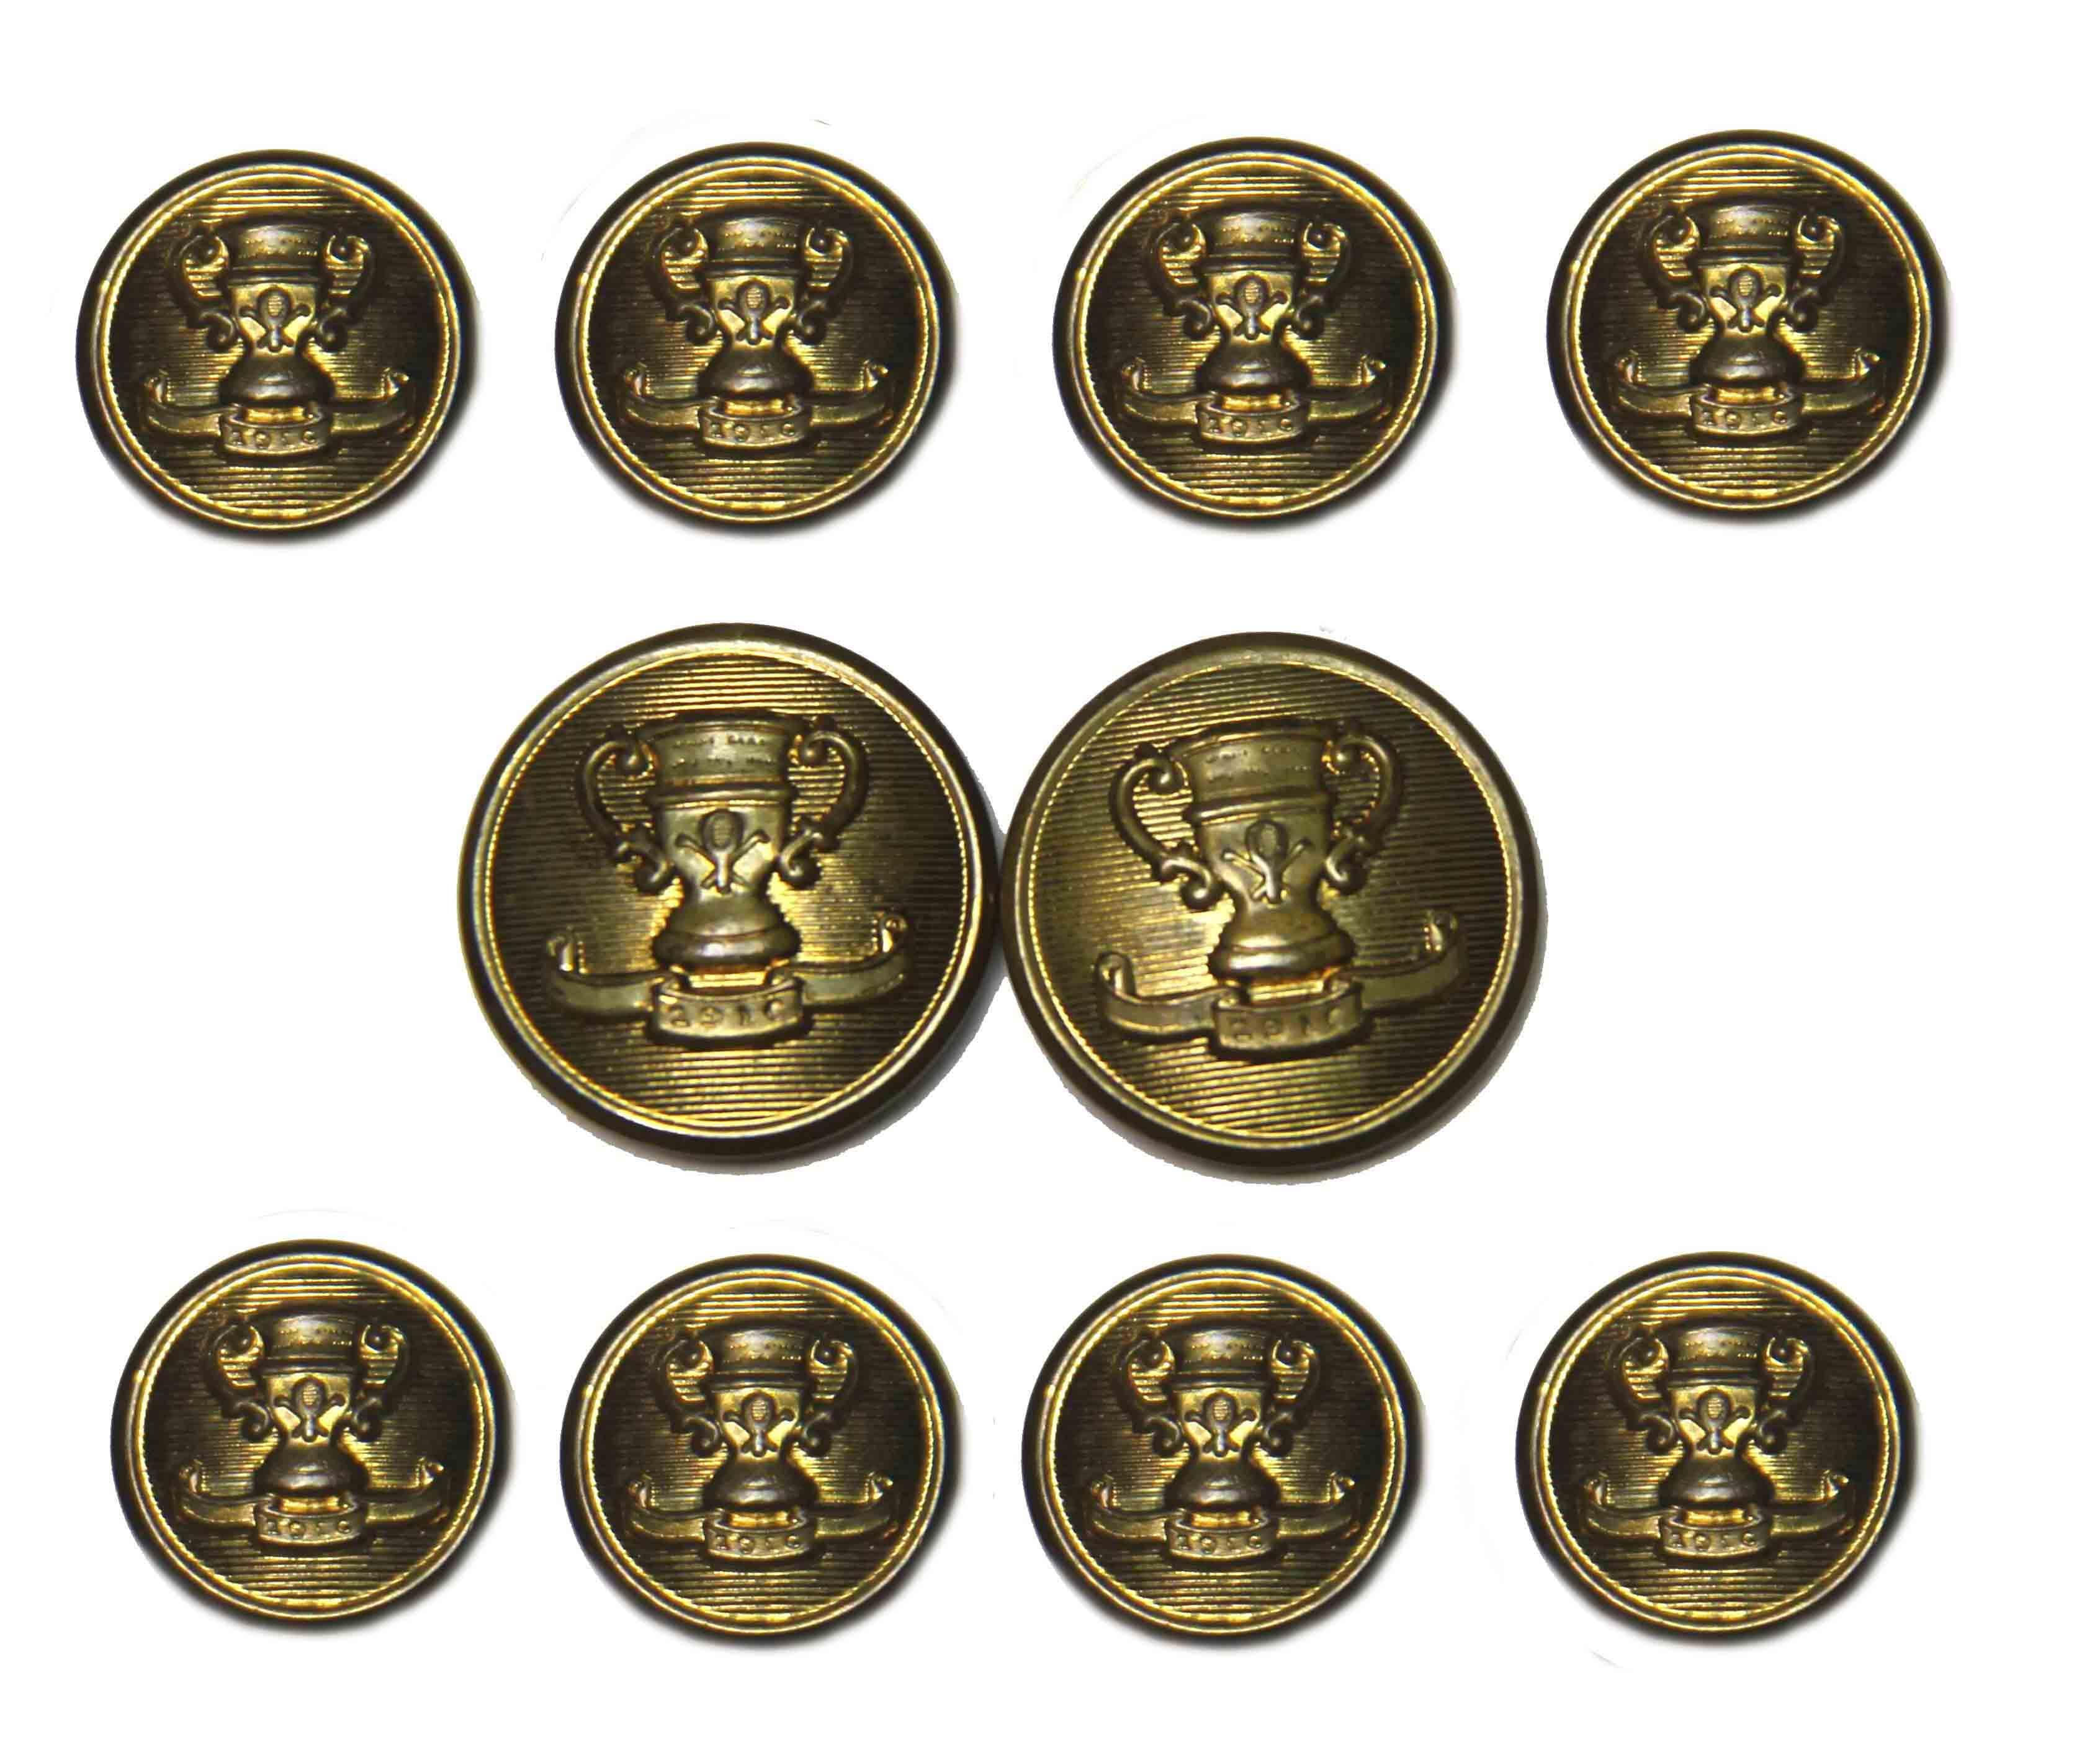 Vintage 1970s Waterbury Blazer Buttons Set Gold Brass Winners Cup Men's